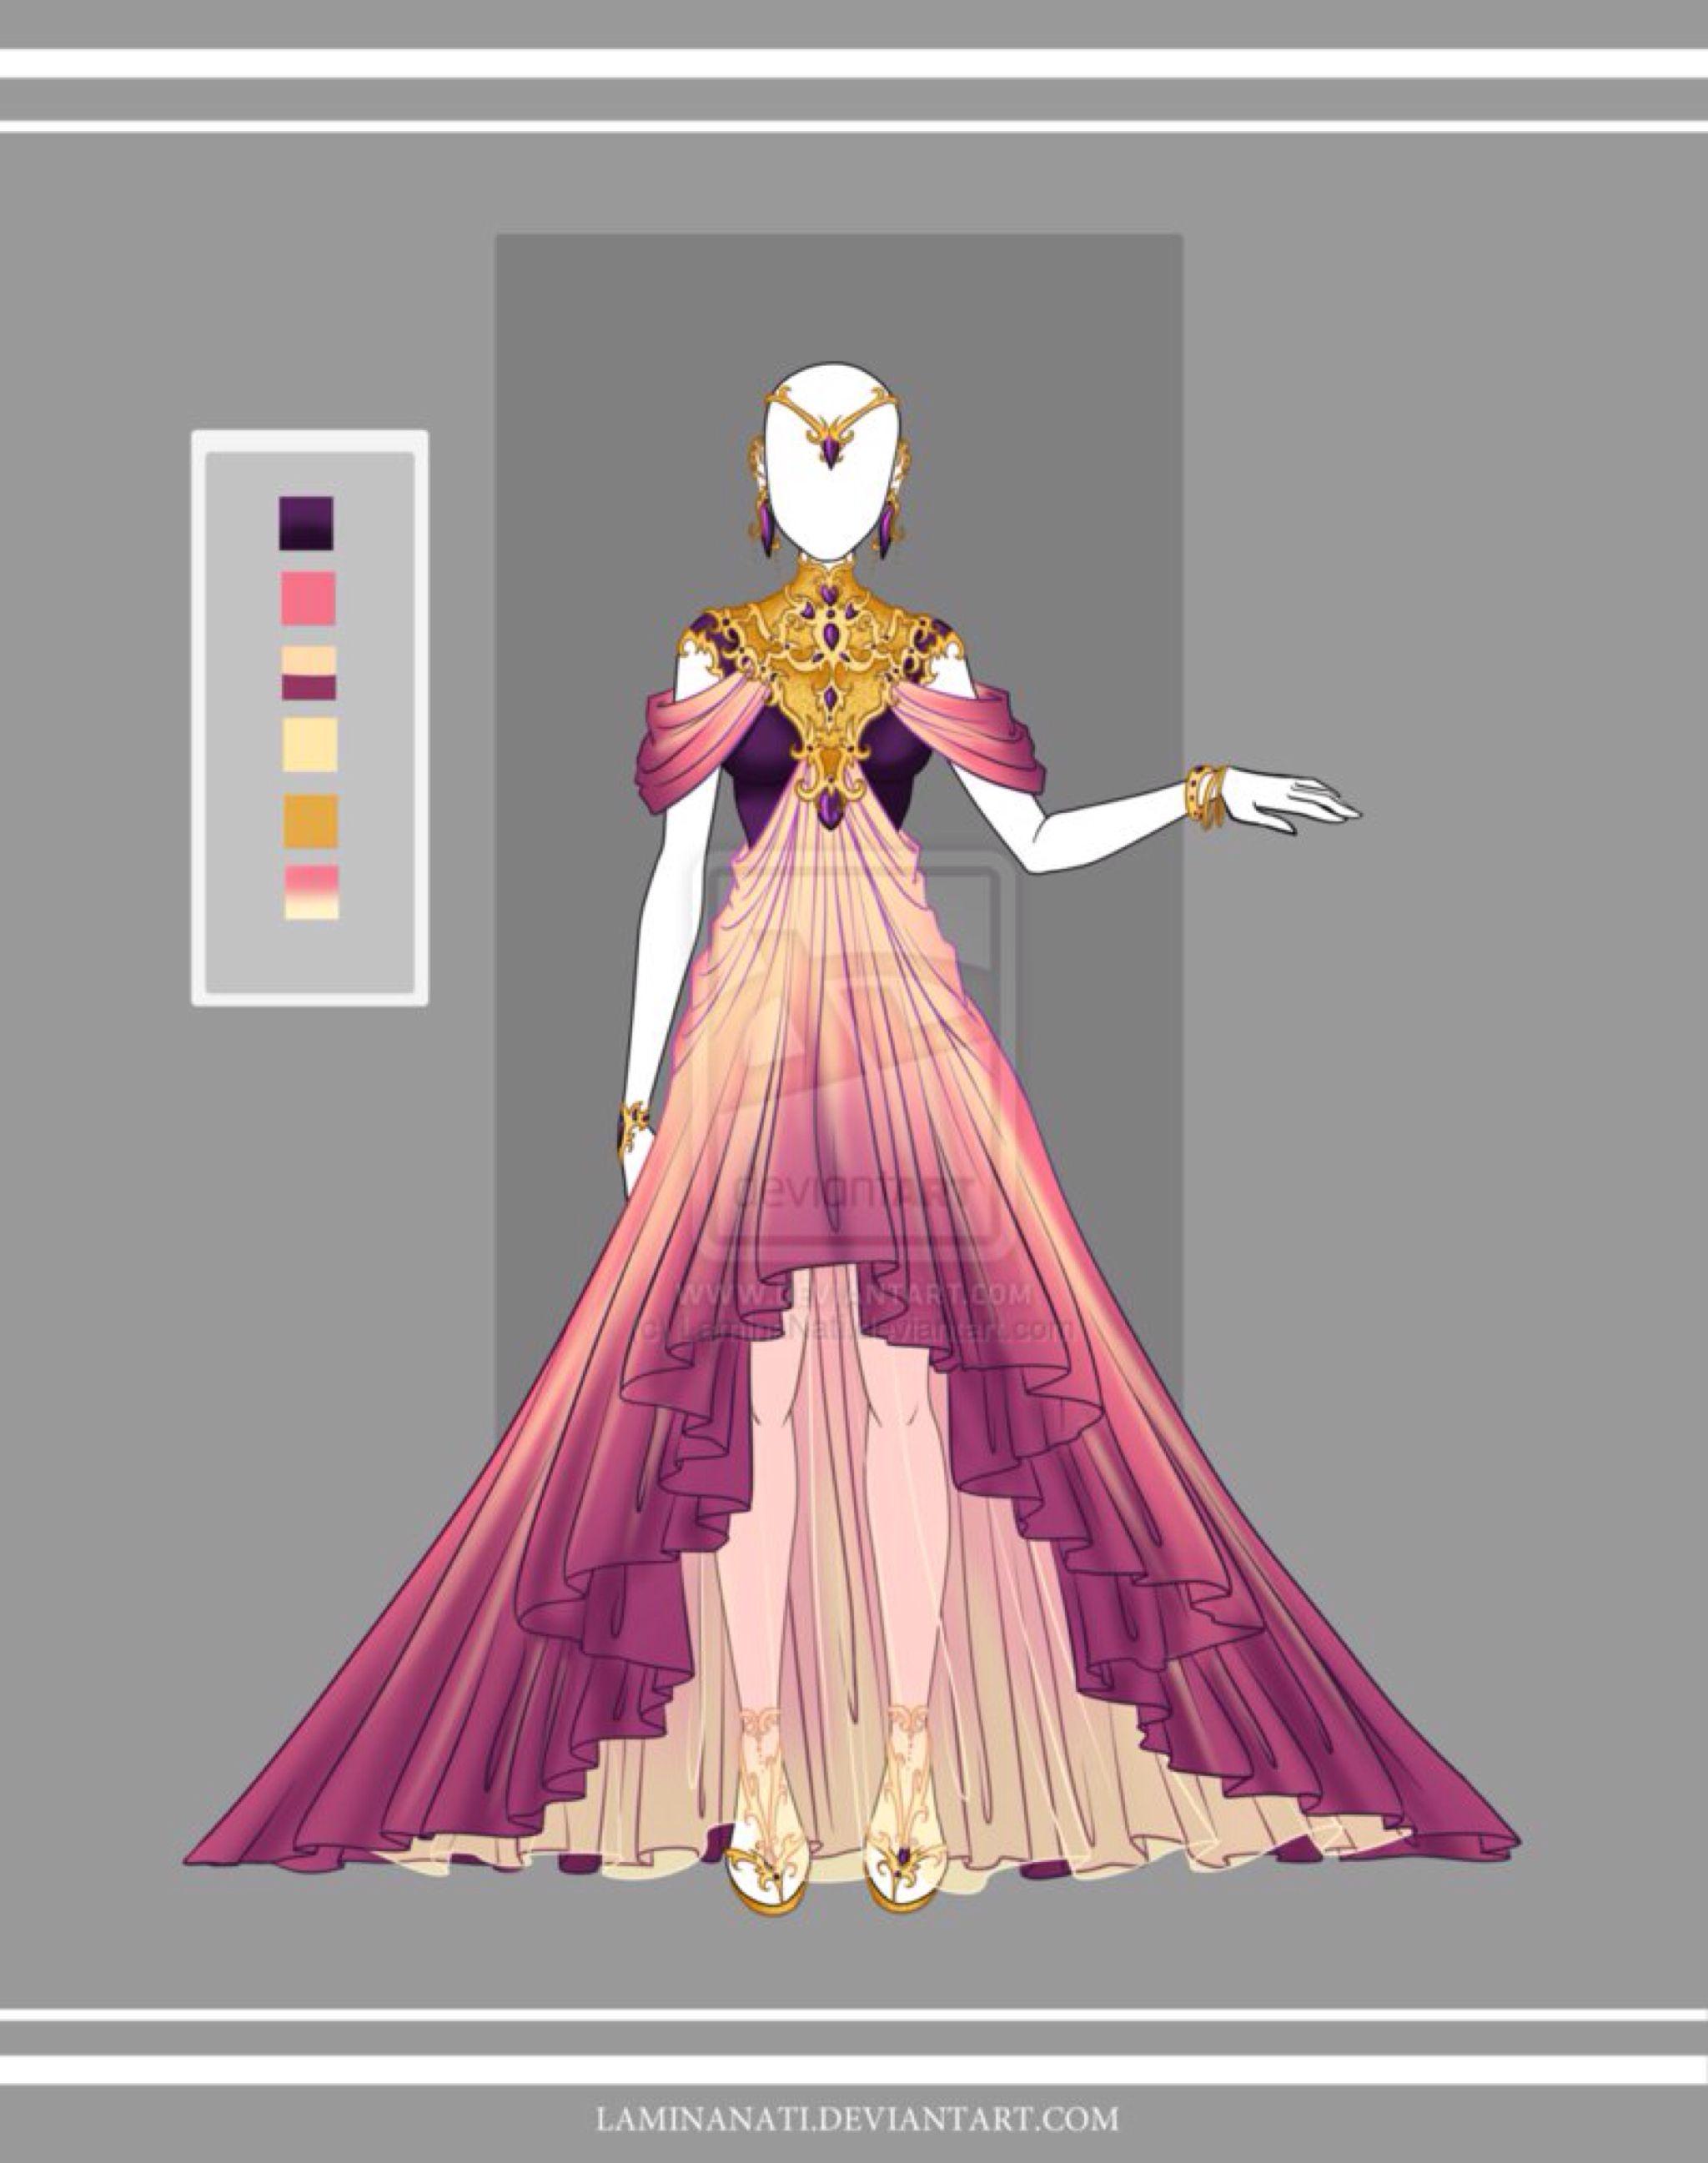 Pin de Kaitlin Toney en Thorellian Fashion | Pinterest | Traje ...